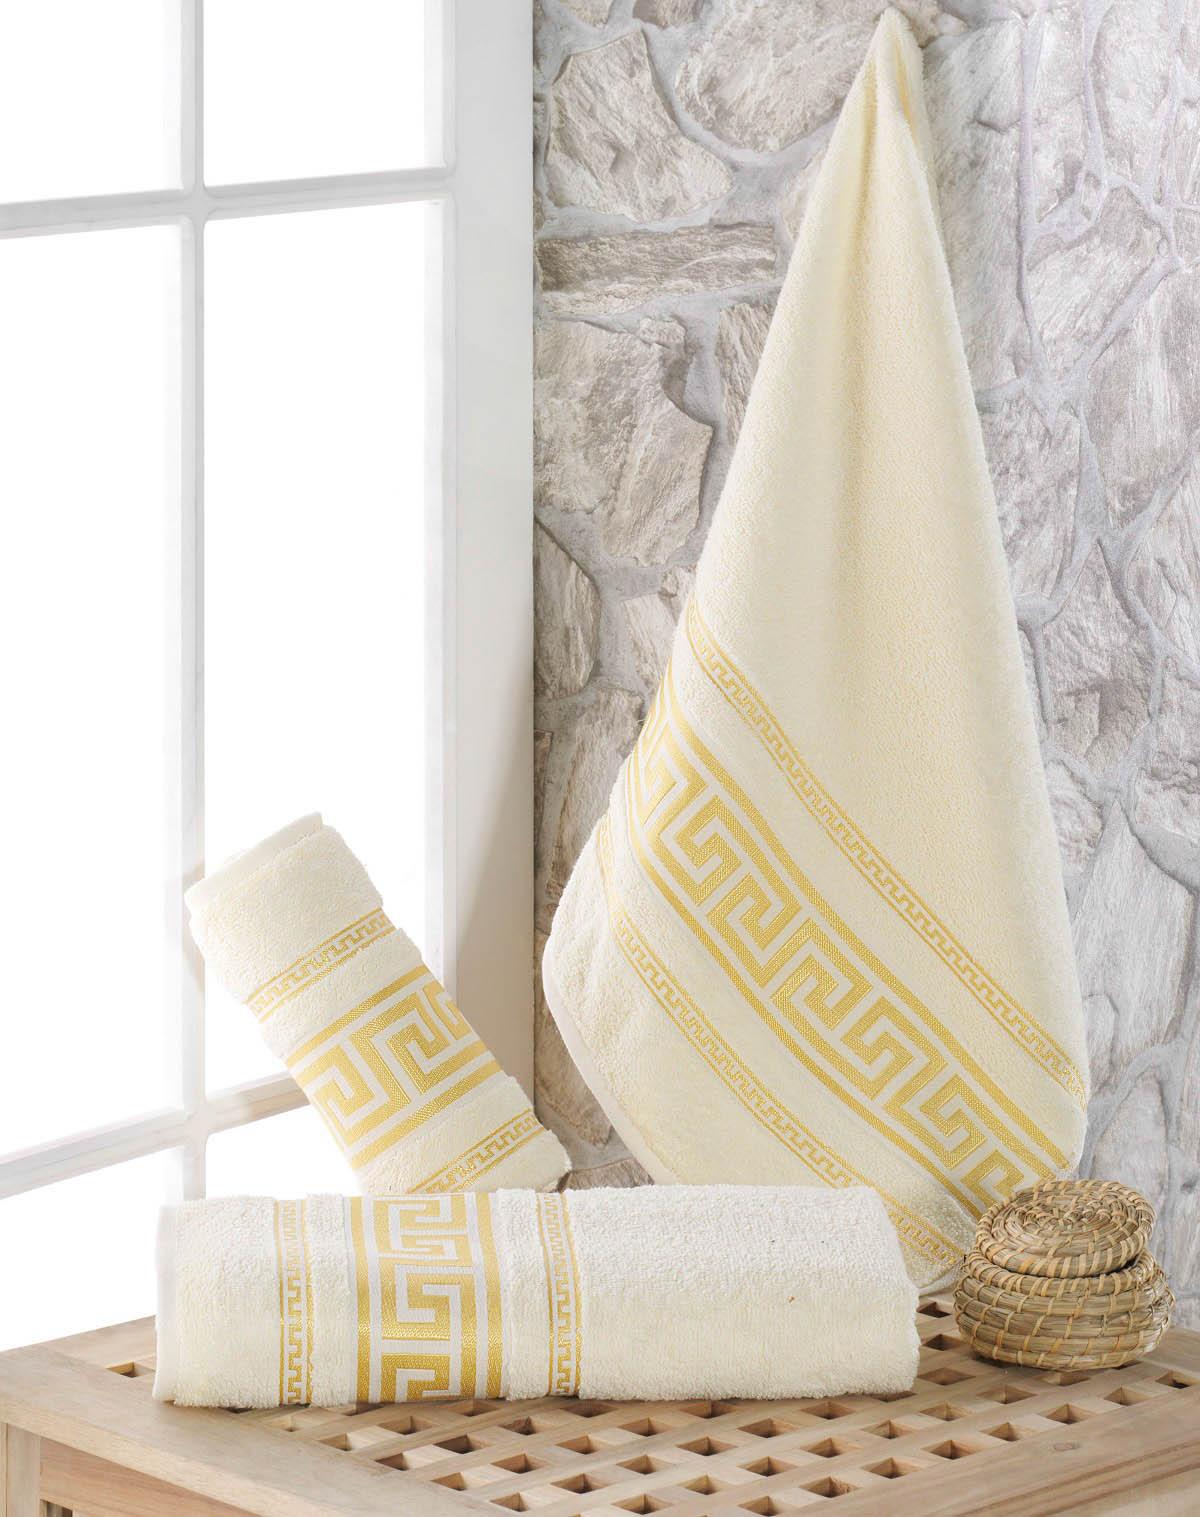 Полотенца Karna Полотенце Iteka Цвет: Кремовый (70х140 см) полотенца karna полотенце iteka цвет коричневый 70х140 см